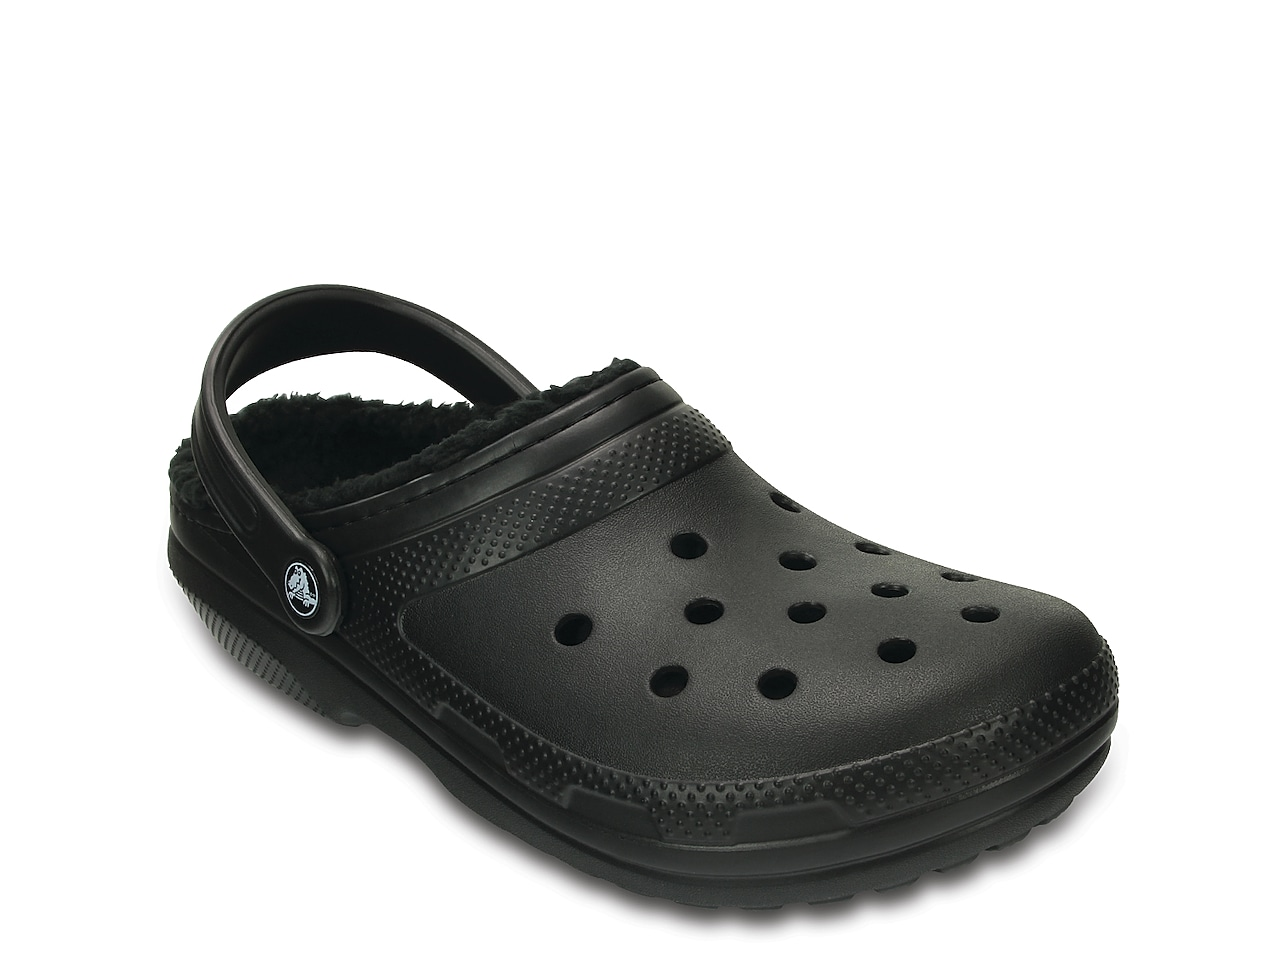 Crocs Classic Lined Clog - Women's Women's Shoes | DSW